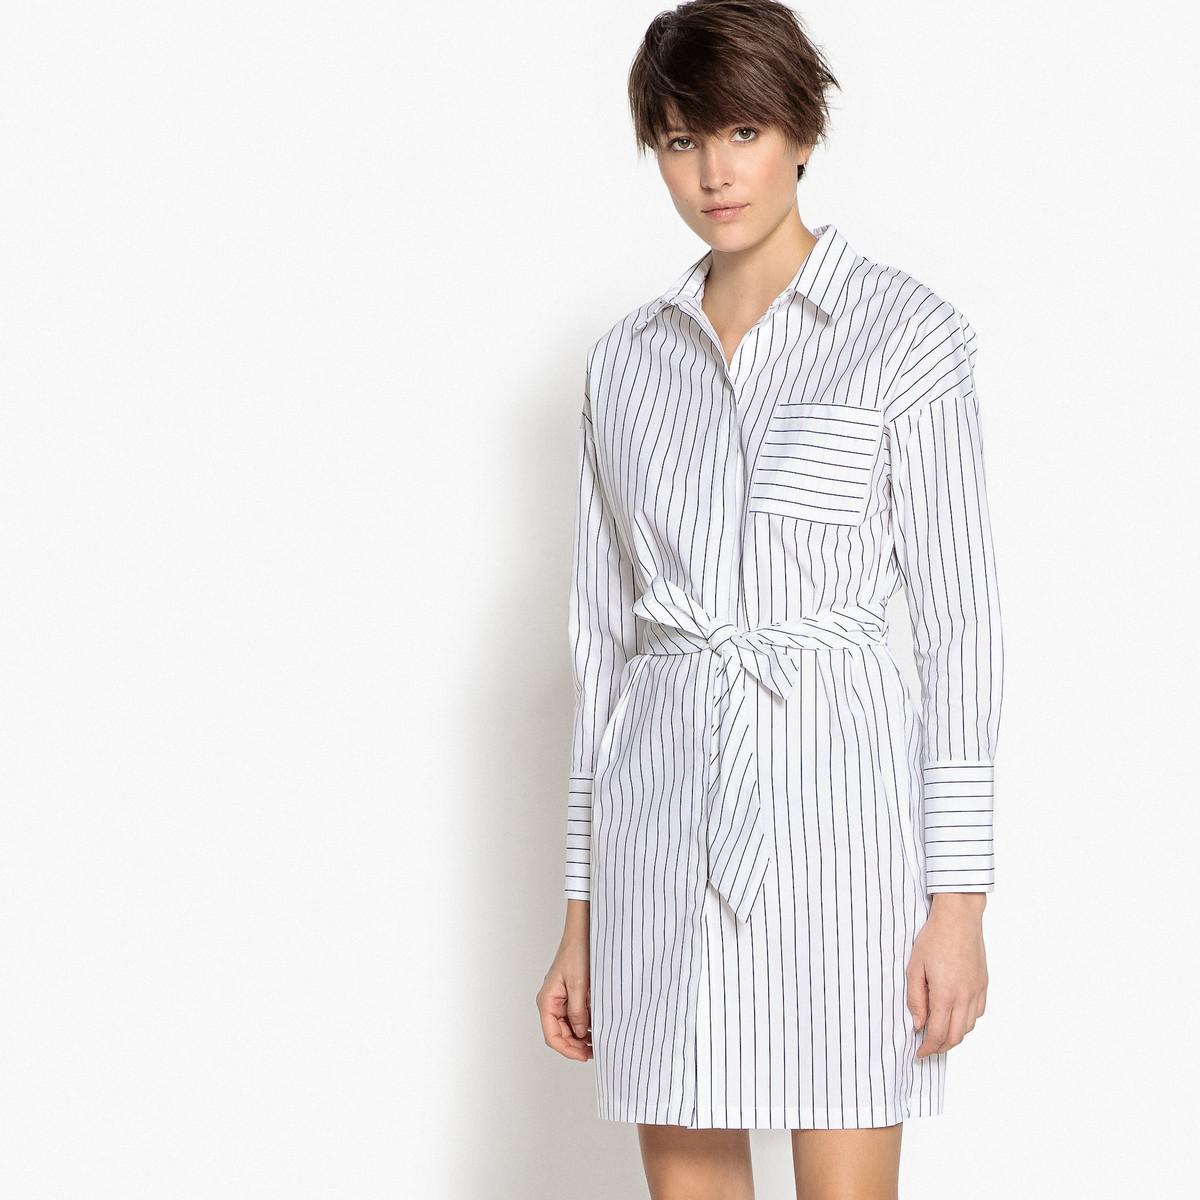 721dccda65 Lyst - La Redoute Stripe Print Short Shift Dress in White